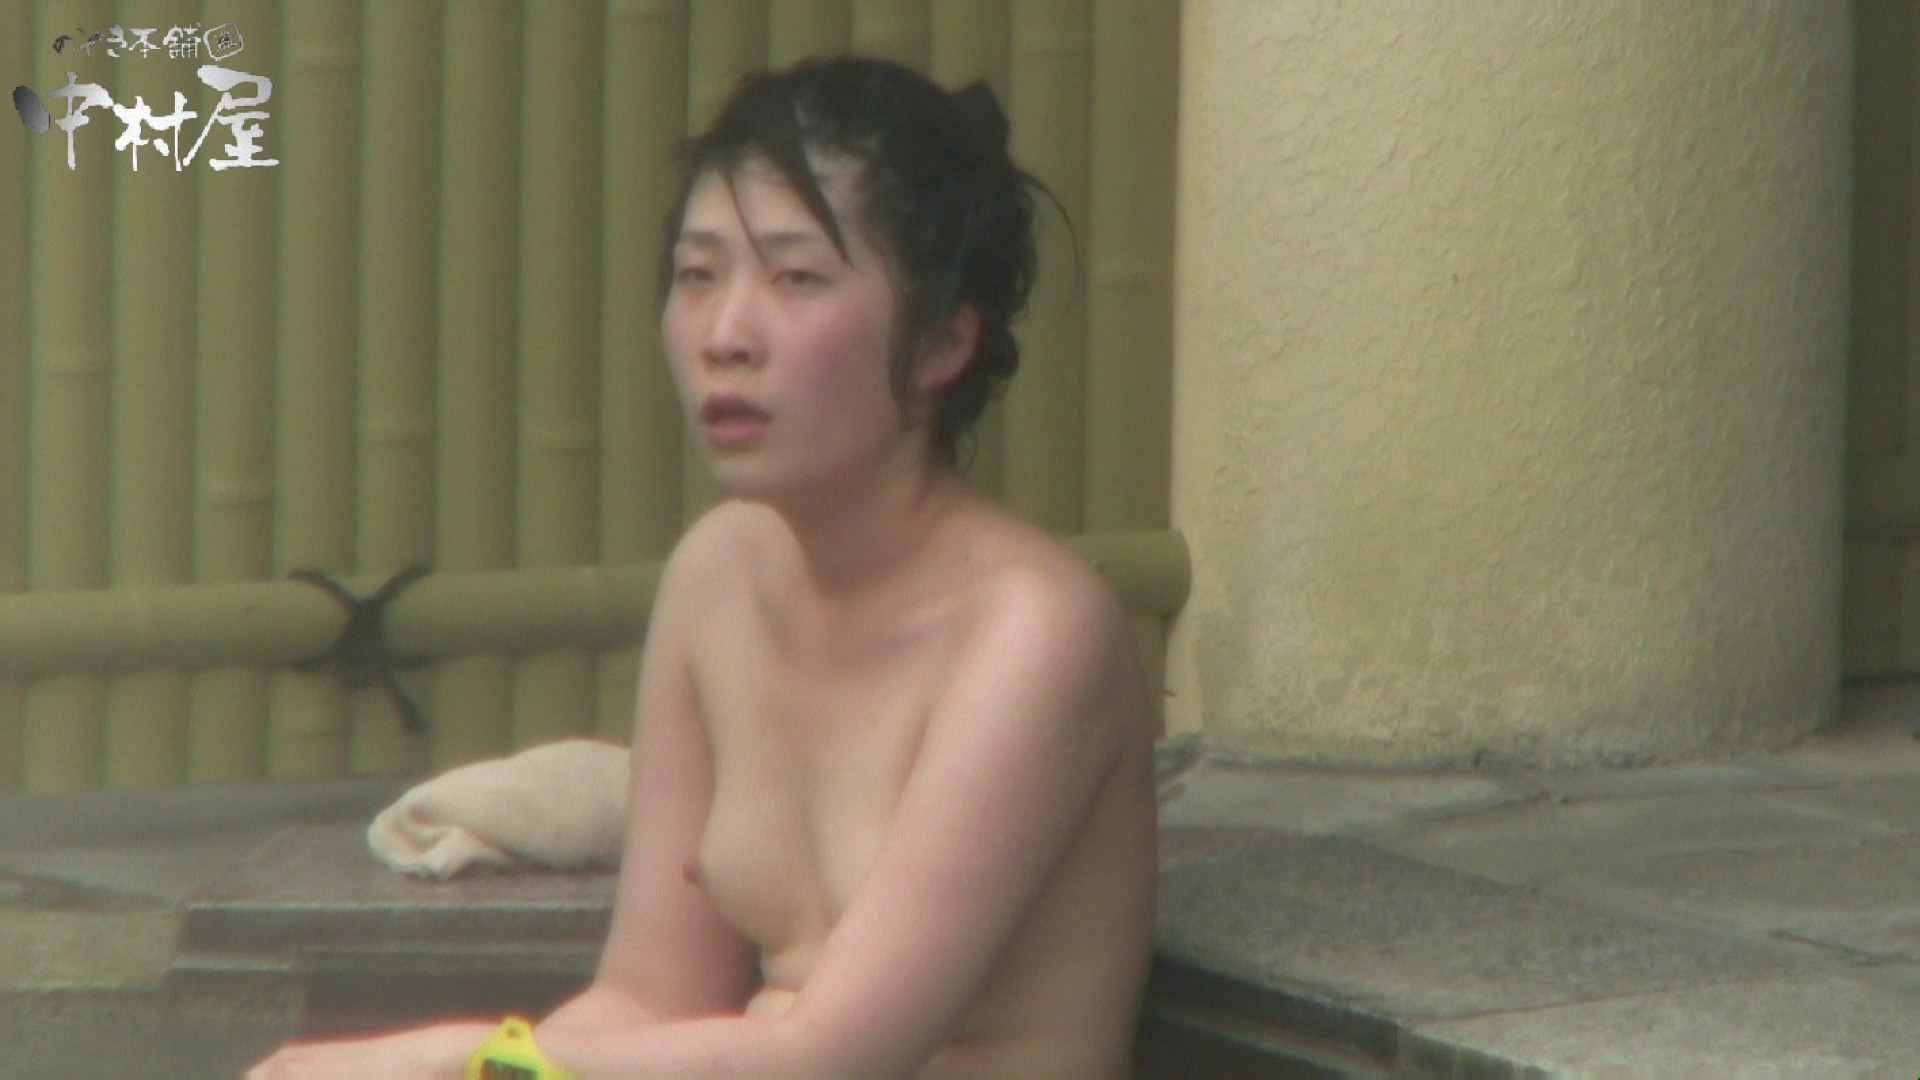 Aquaな露天風呂Vol.955 盗撮師作品 | 露天風呂突入  85pic 37